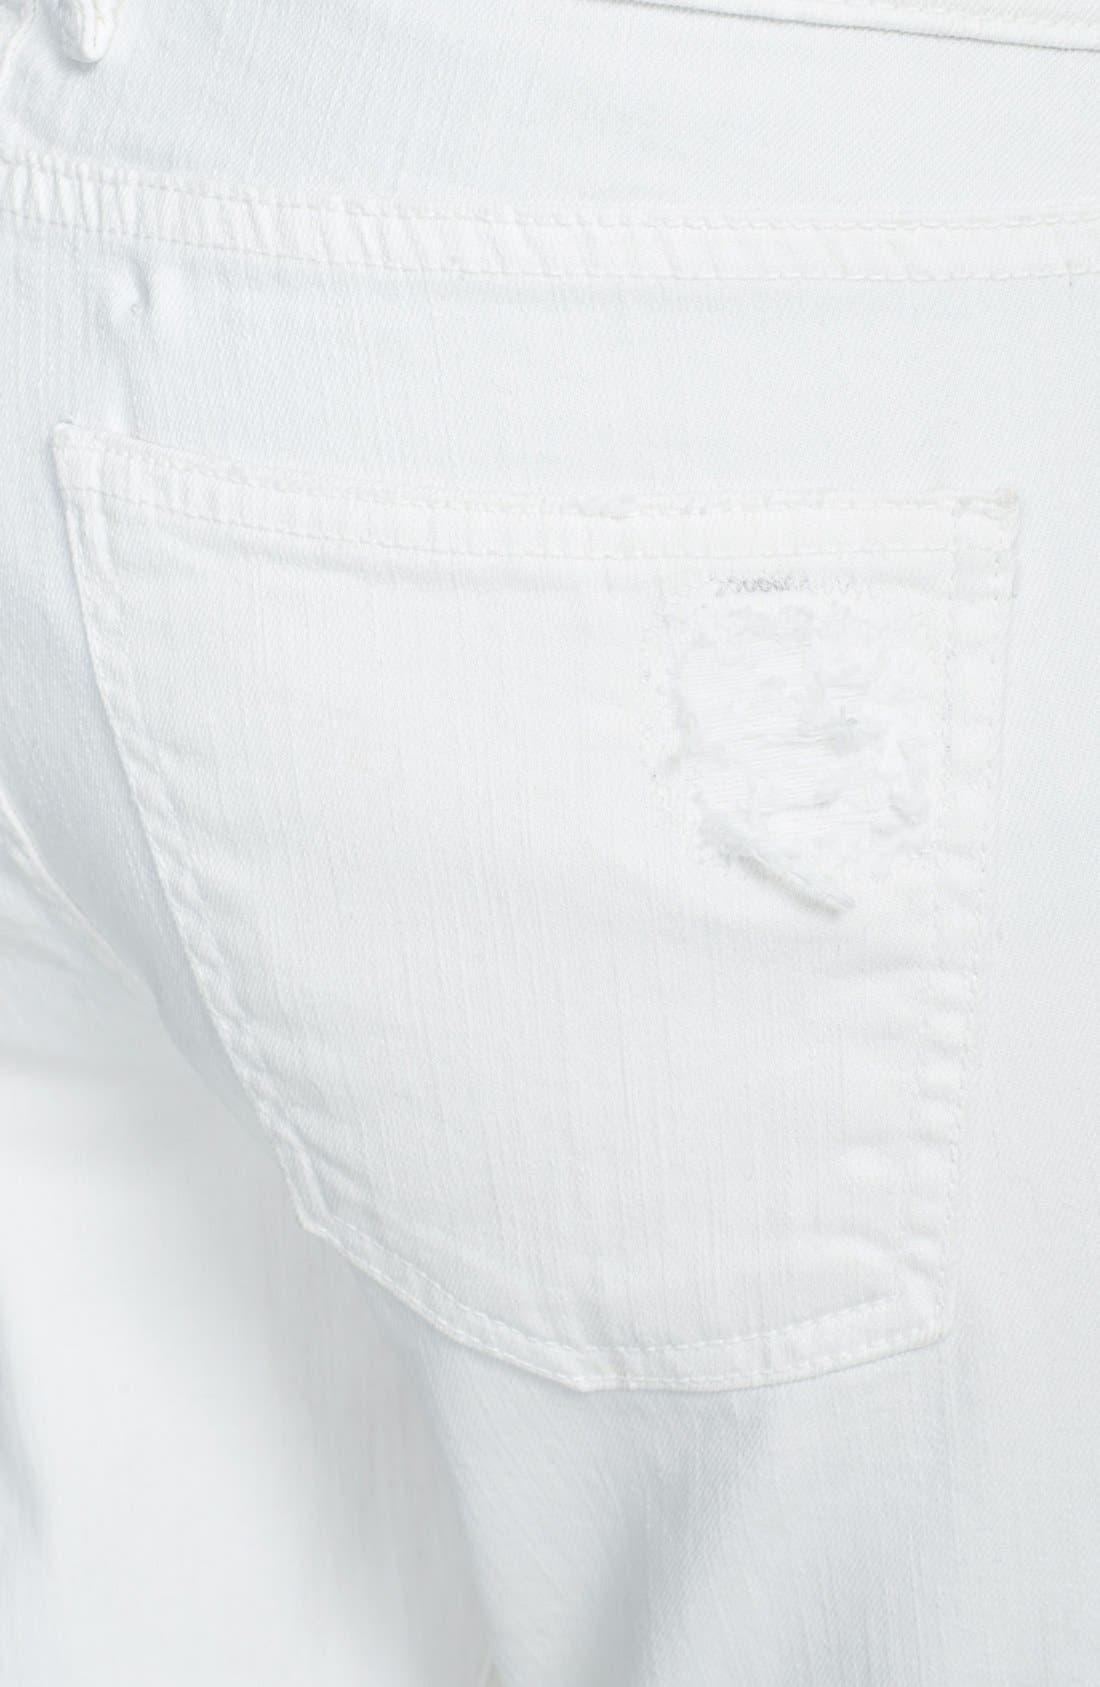 Alternate Image 3  - Current/Elliott 'The Stiletto' Jeans (Dirty White)